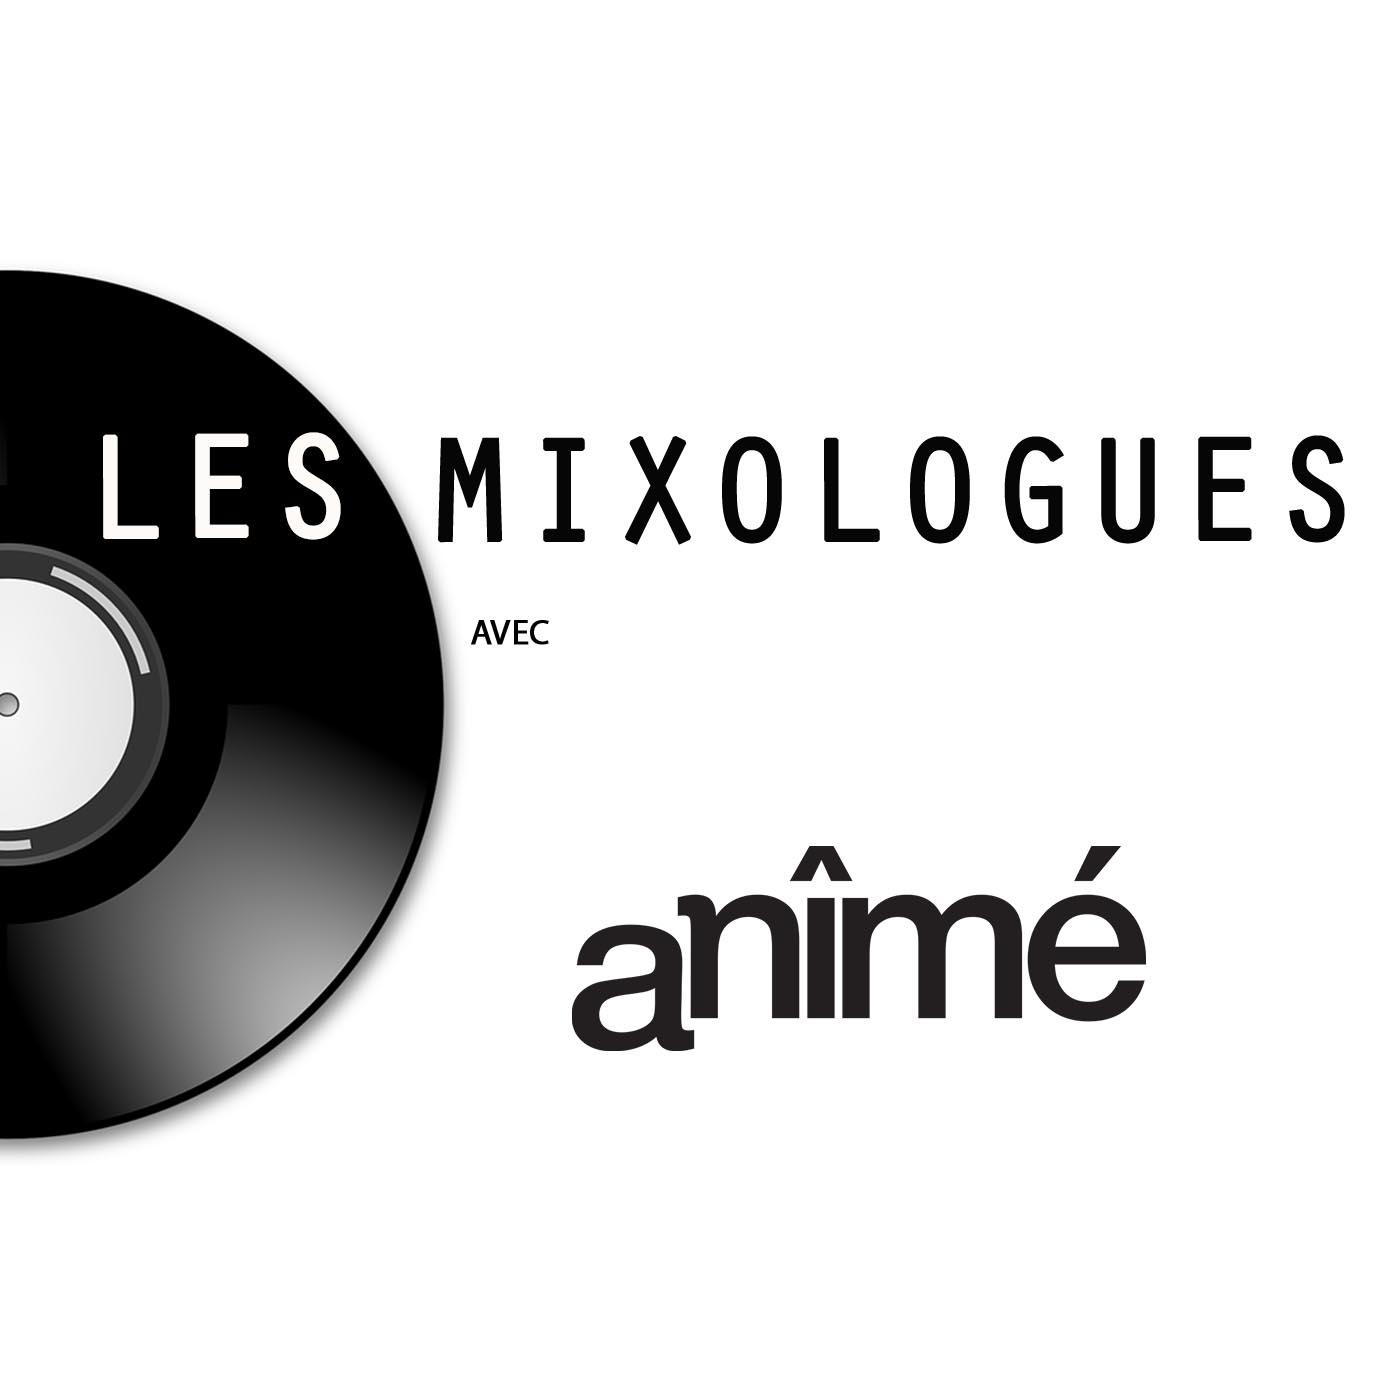 LES MIXOLOGUES AVEC AN - DJ Marks